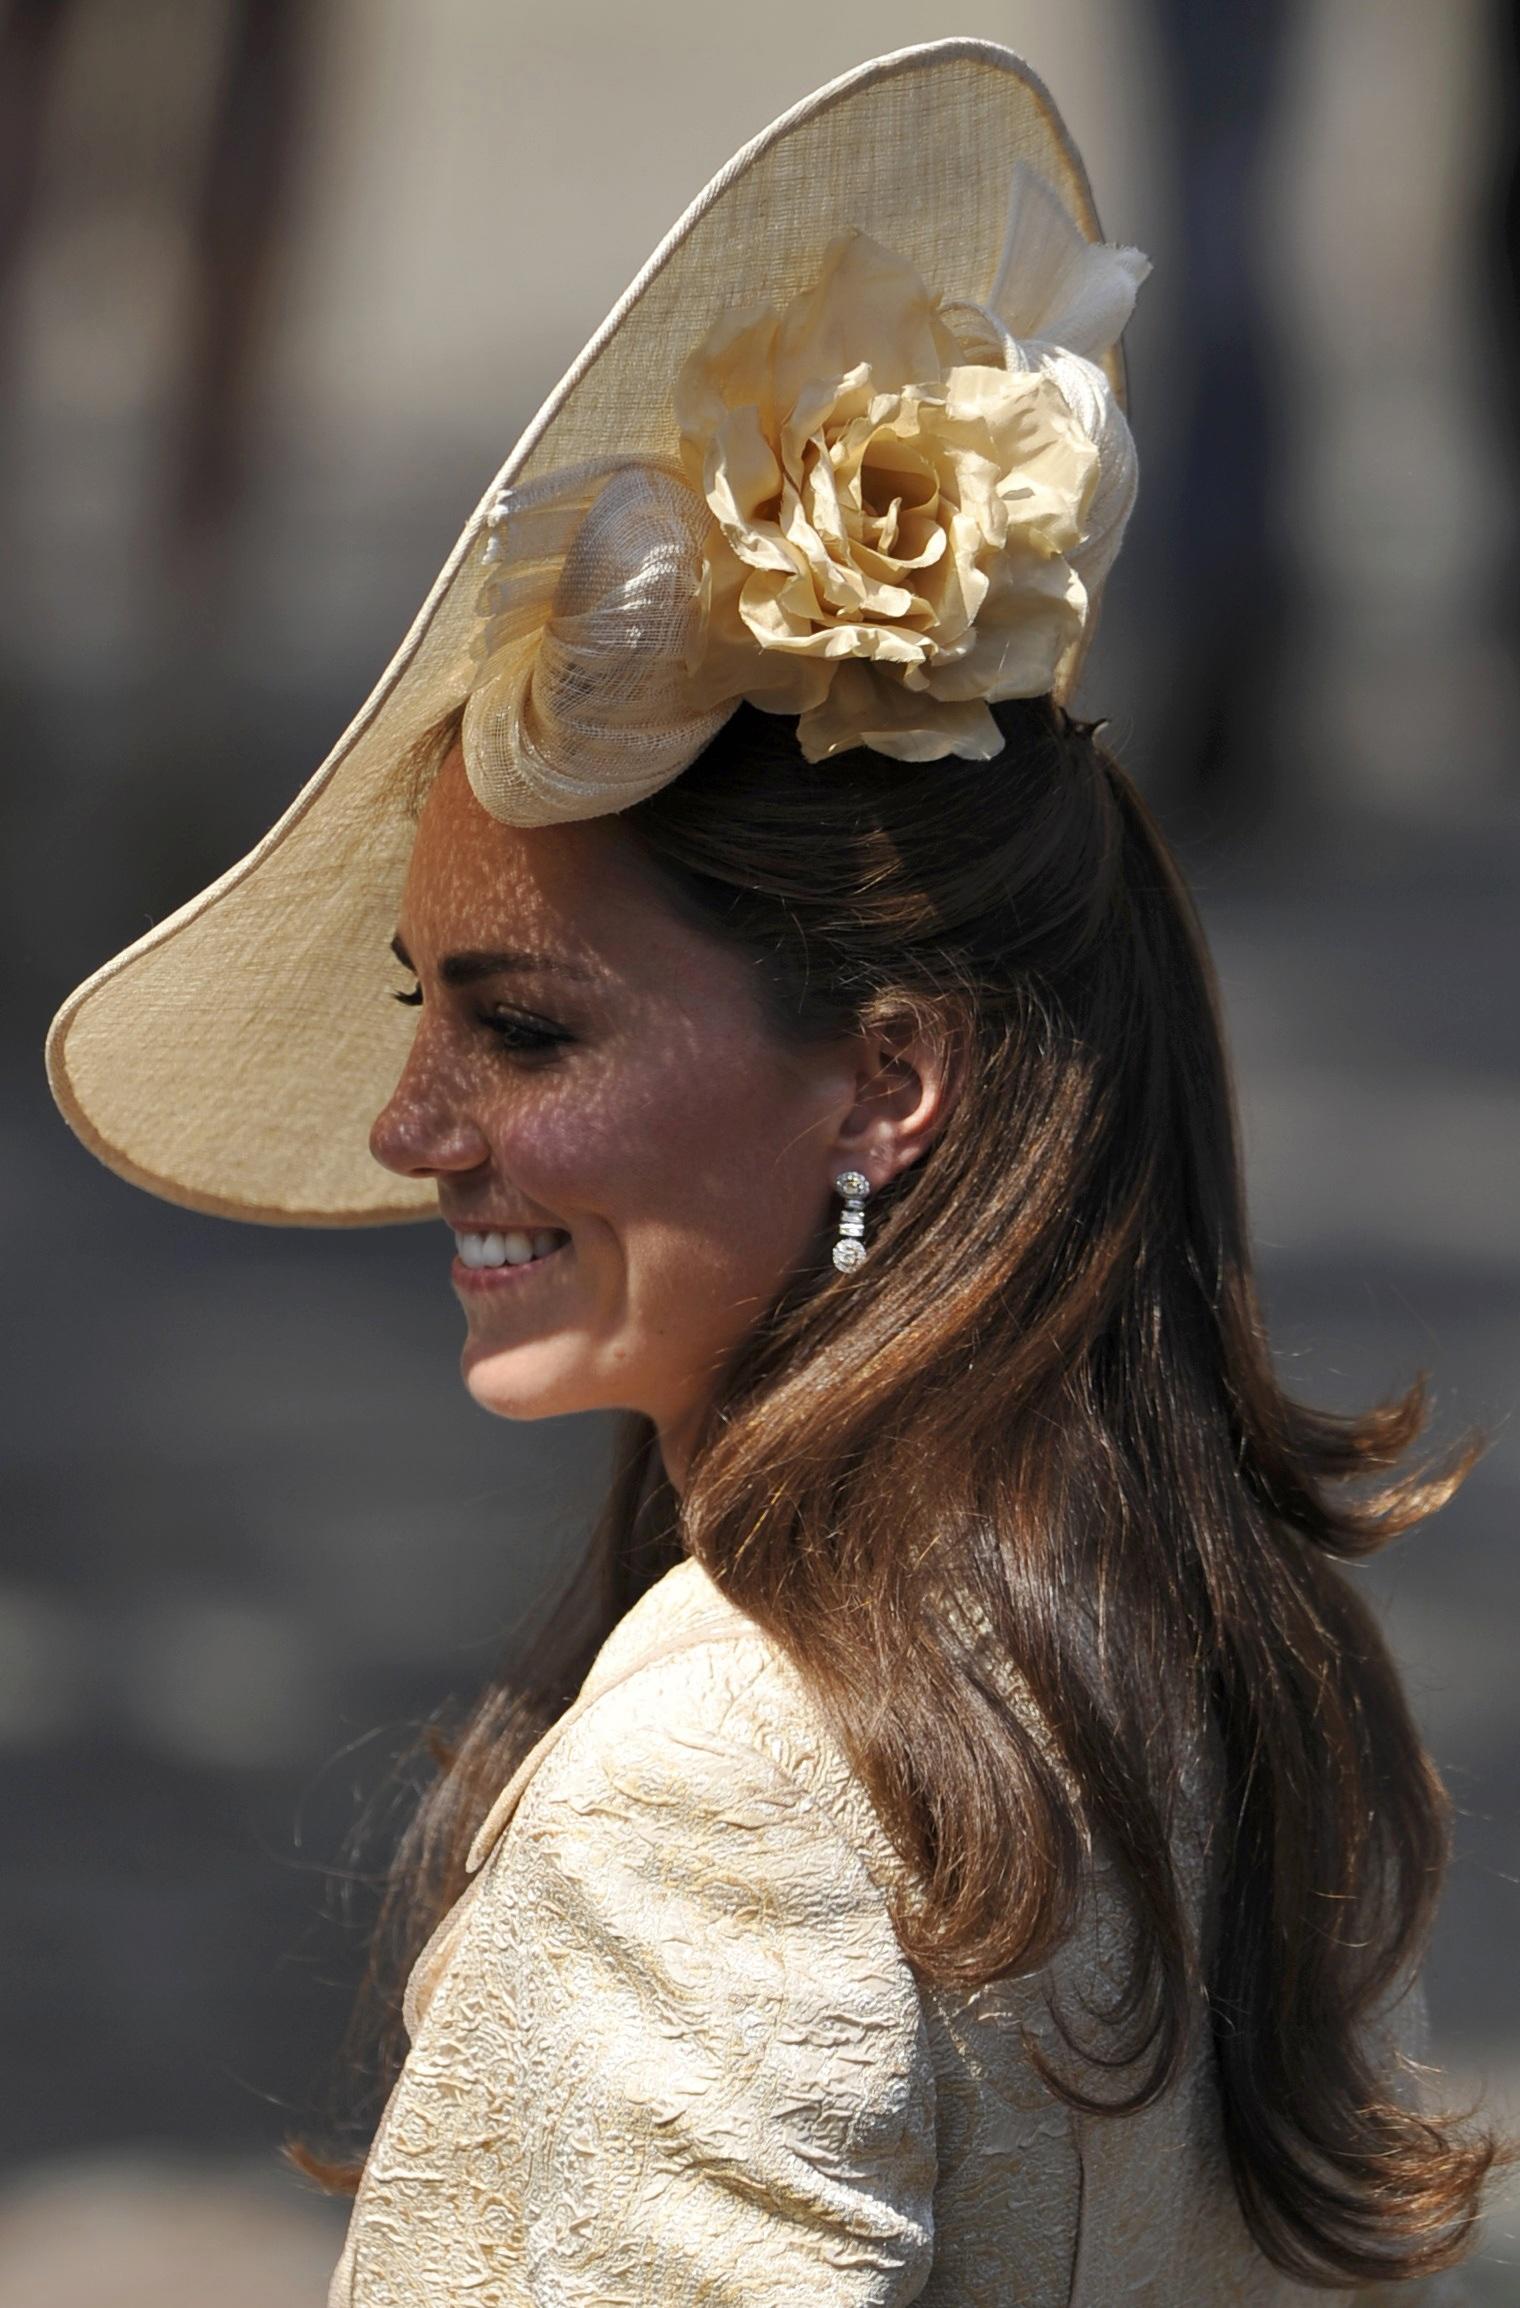 The other royal wedding Queens granddaughter Zara